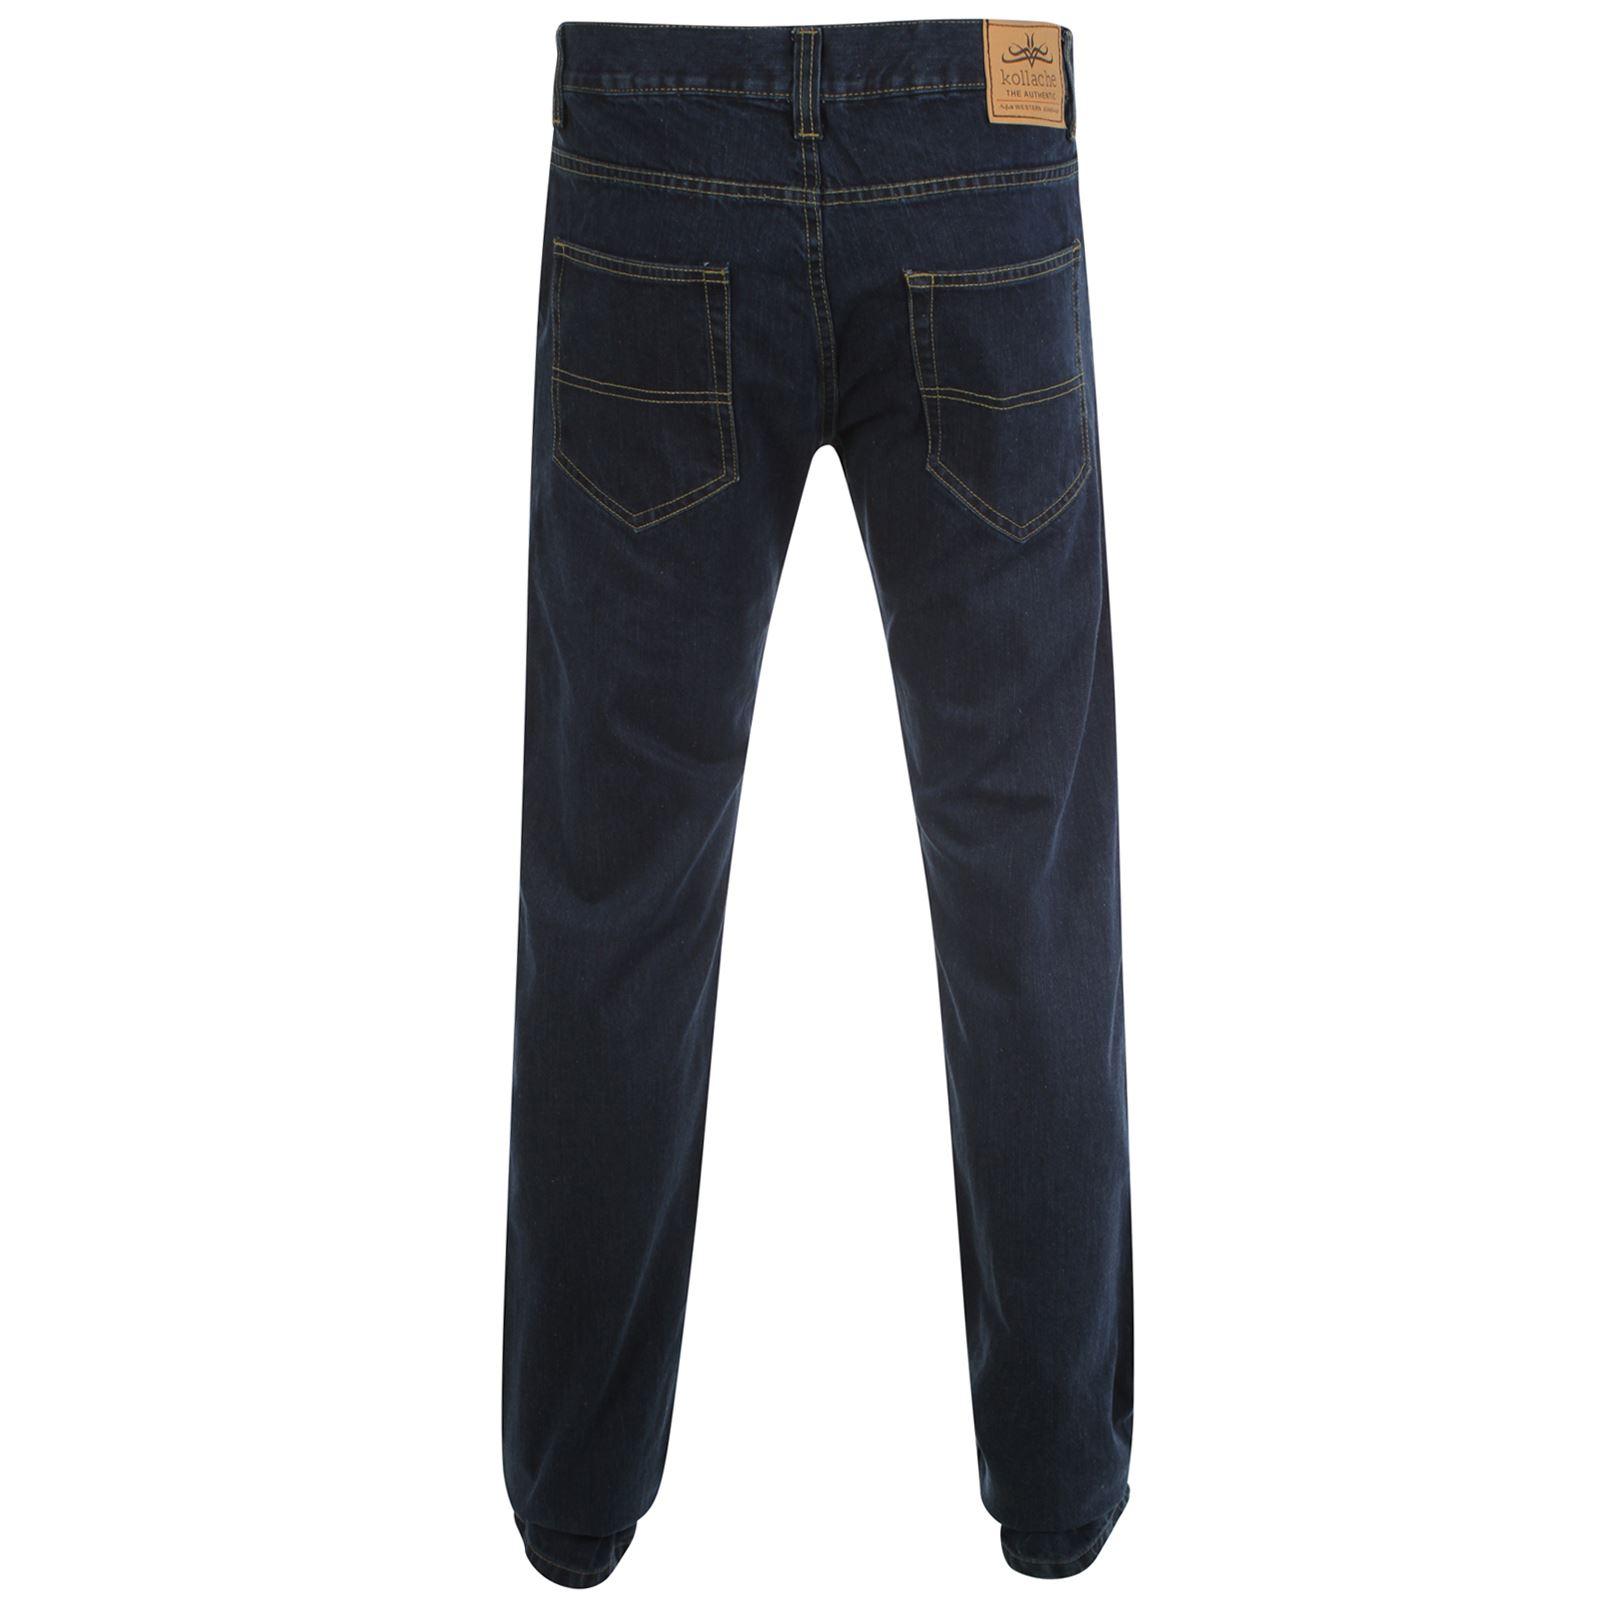 Hombre-pernera-recta-Corte-Normal-Vaquero-Casual-de-algodon-pantalones